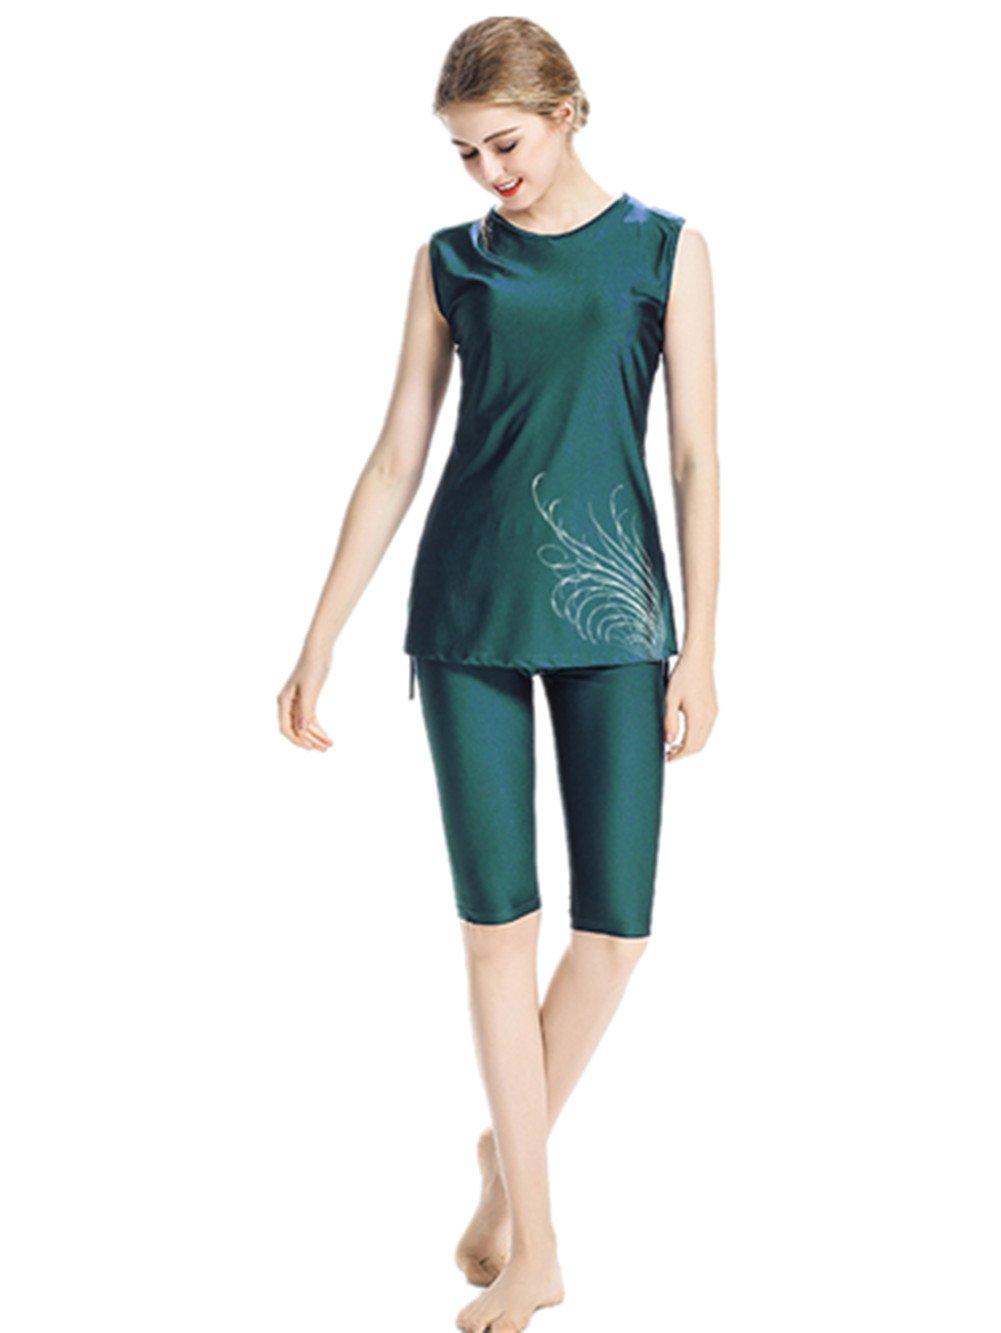 CaptainSwim Women Muslim Swimwear Girls Swimsuit Burqini Islamic Sleeveless Swimwear Ladies Beachwear Burkini (Green, Int'l~XX-Large)